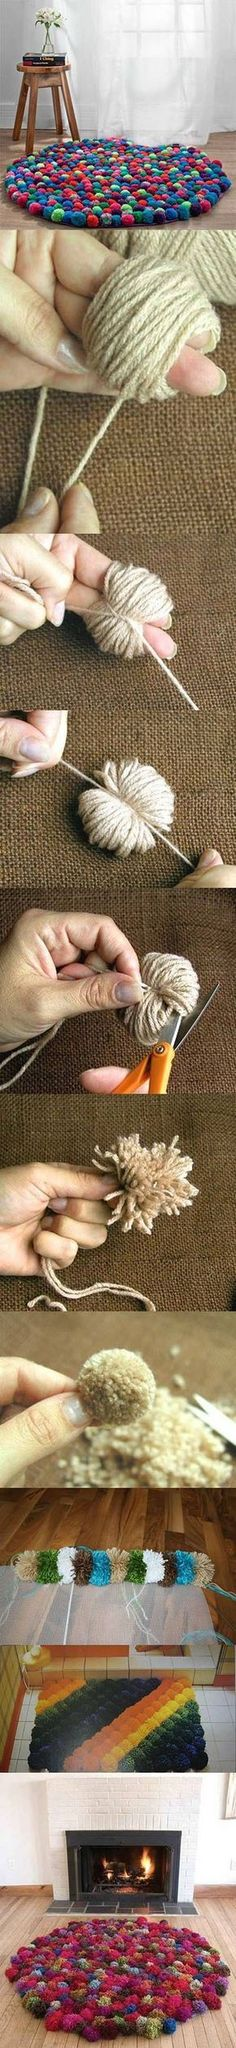 Diy Beautiful Carpet | DIY & Crafts Tutorials